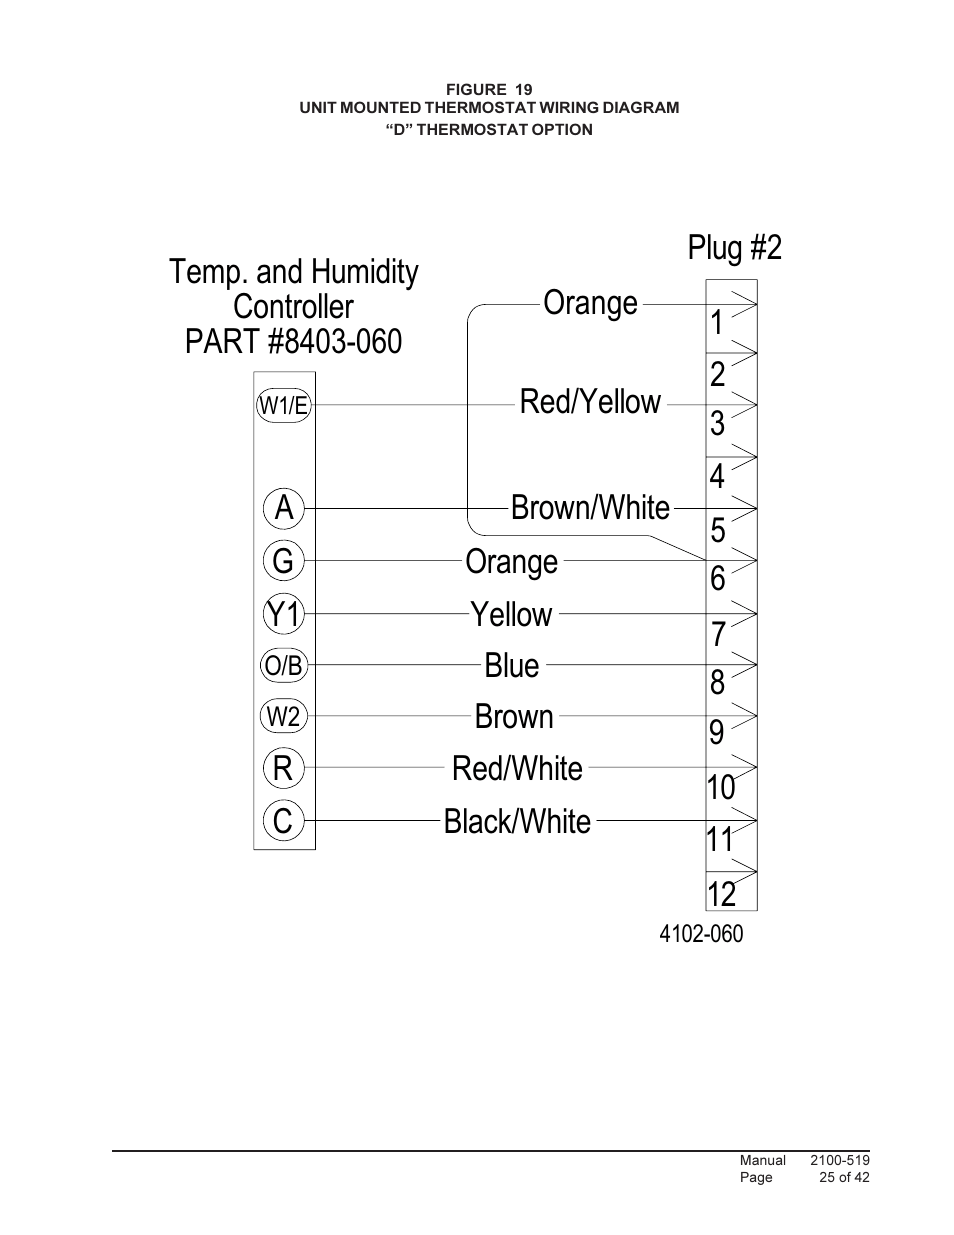 hight resolution of 2orange red white blue 9 ry1 plug 2 c bard qtec series